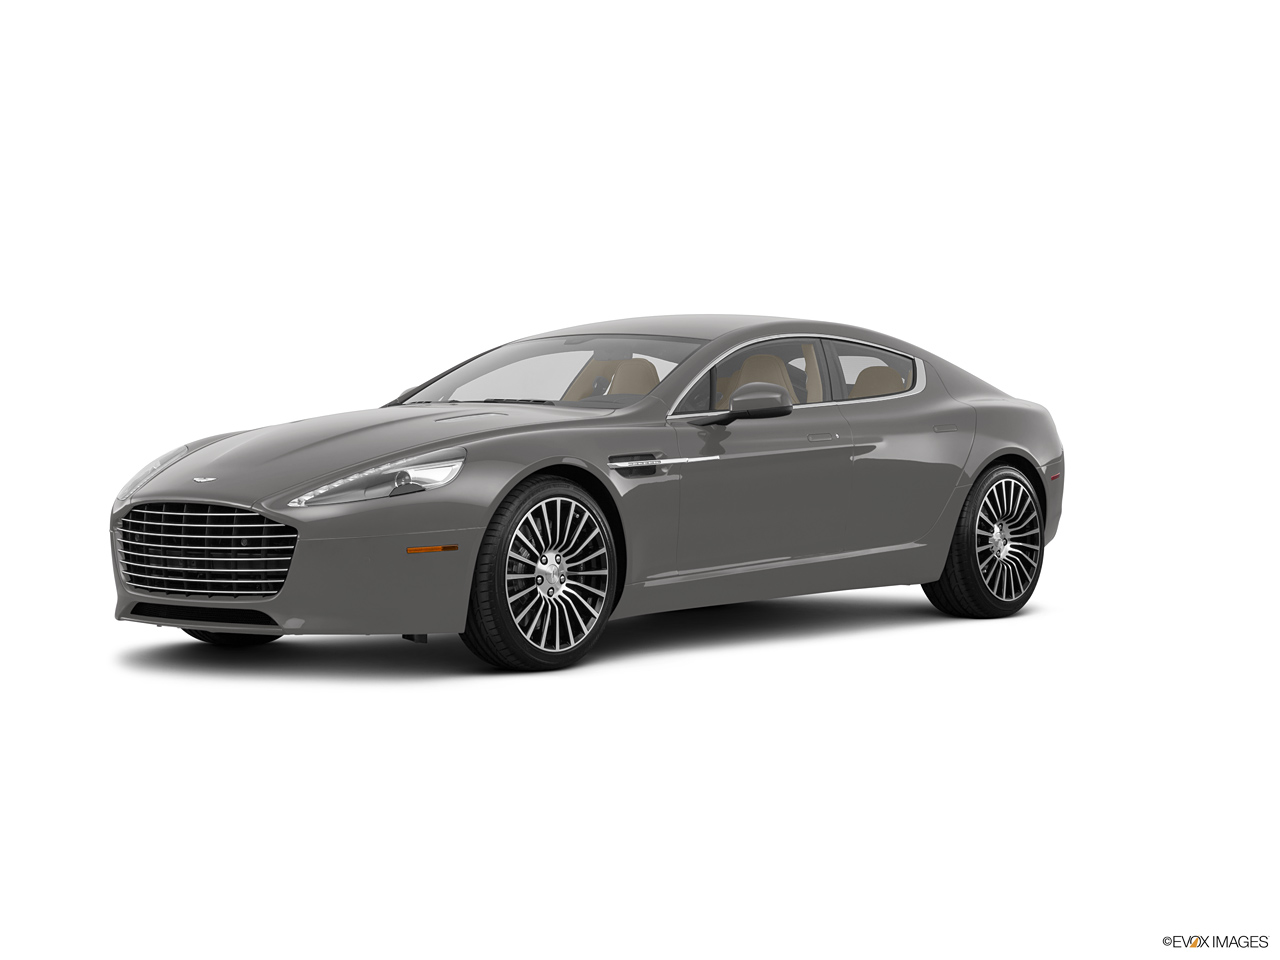 aston martin rapide s 2016 v12 in egypt new car prices. Black Bedroom Furniture Sets. Home Design Ideas